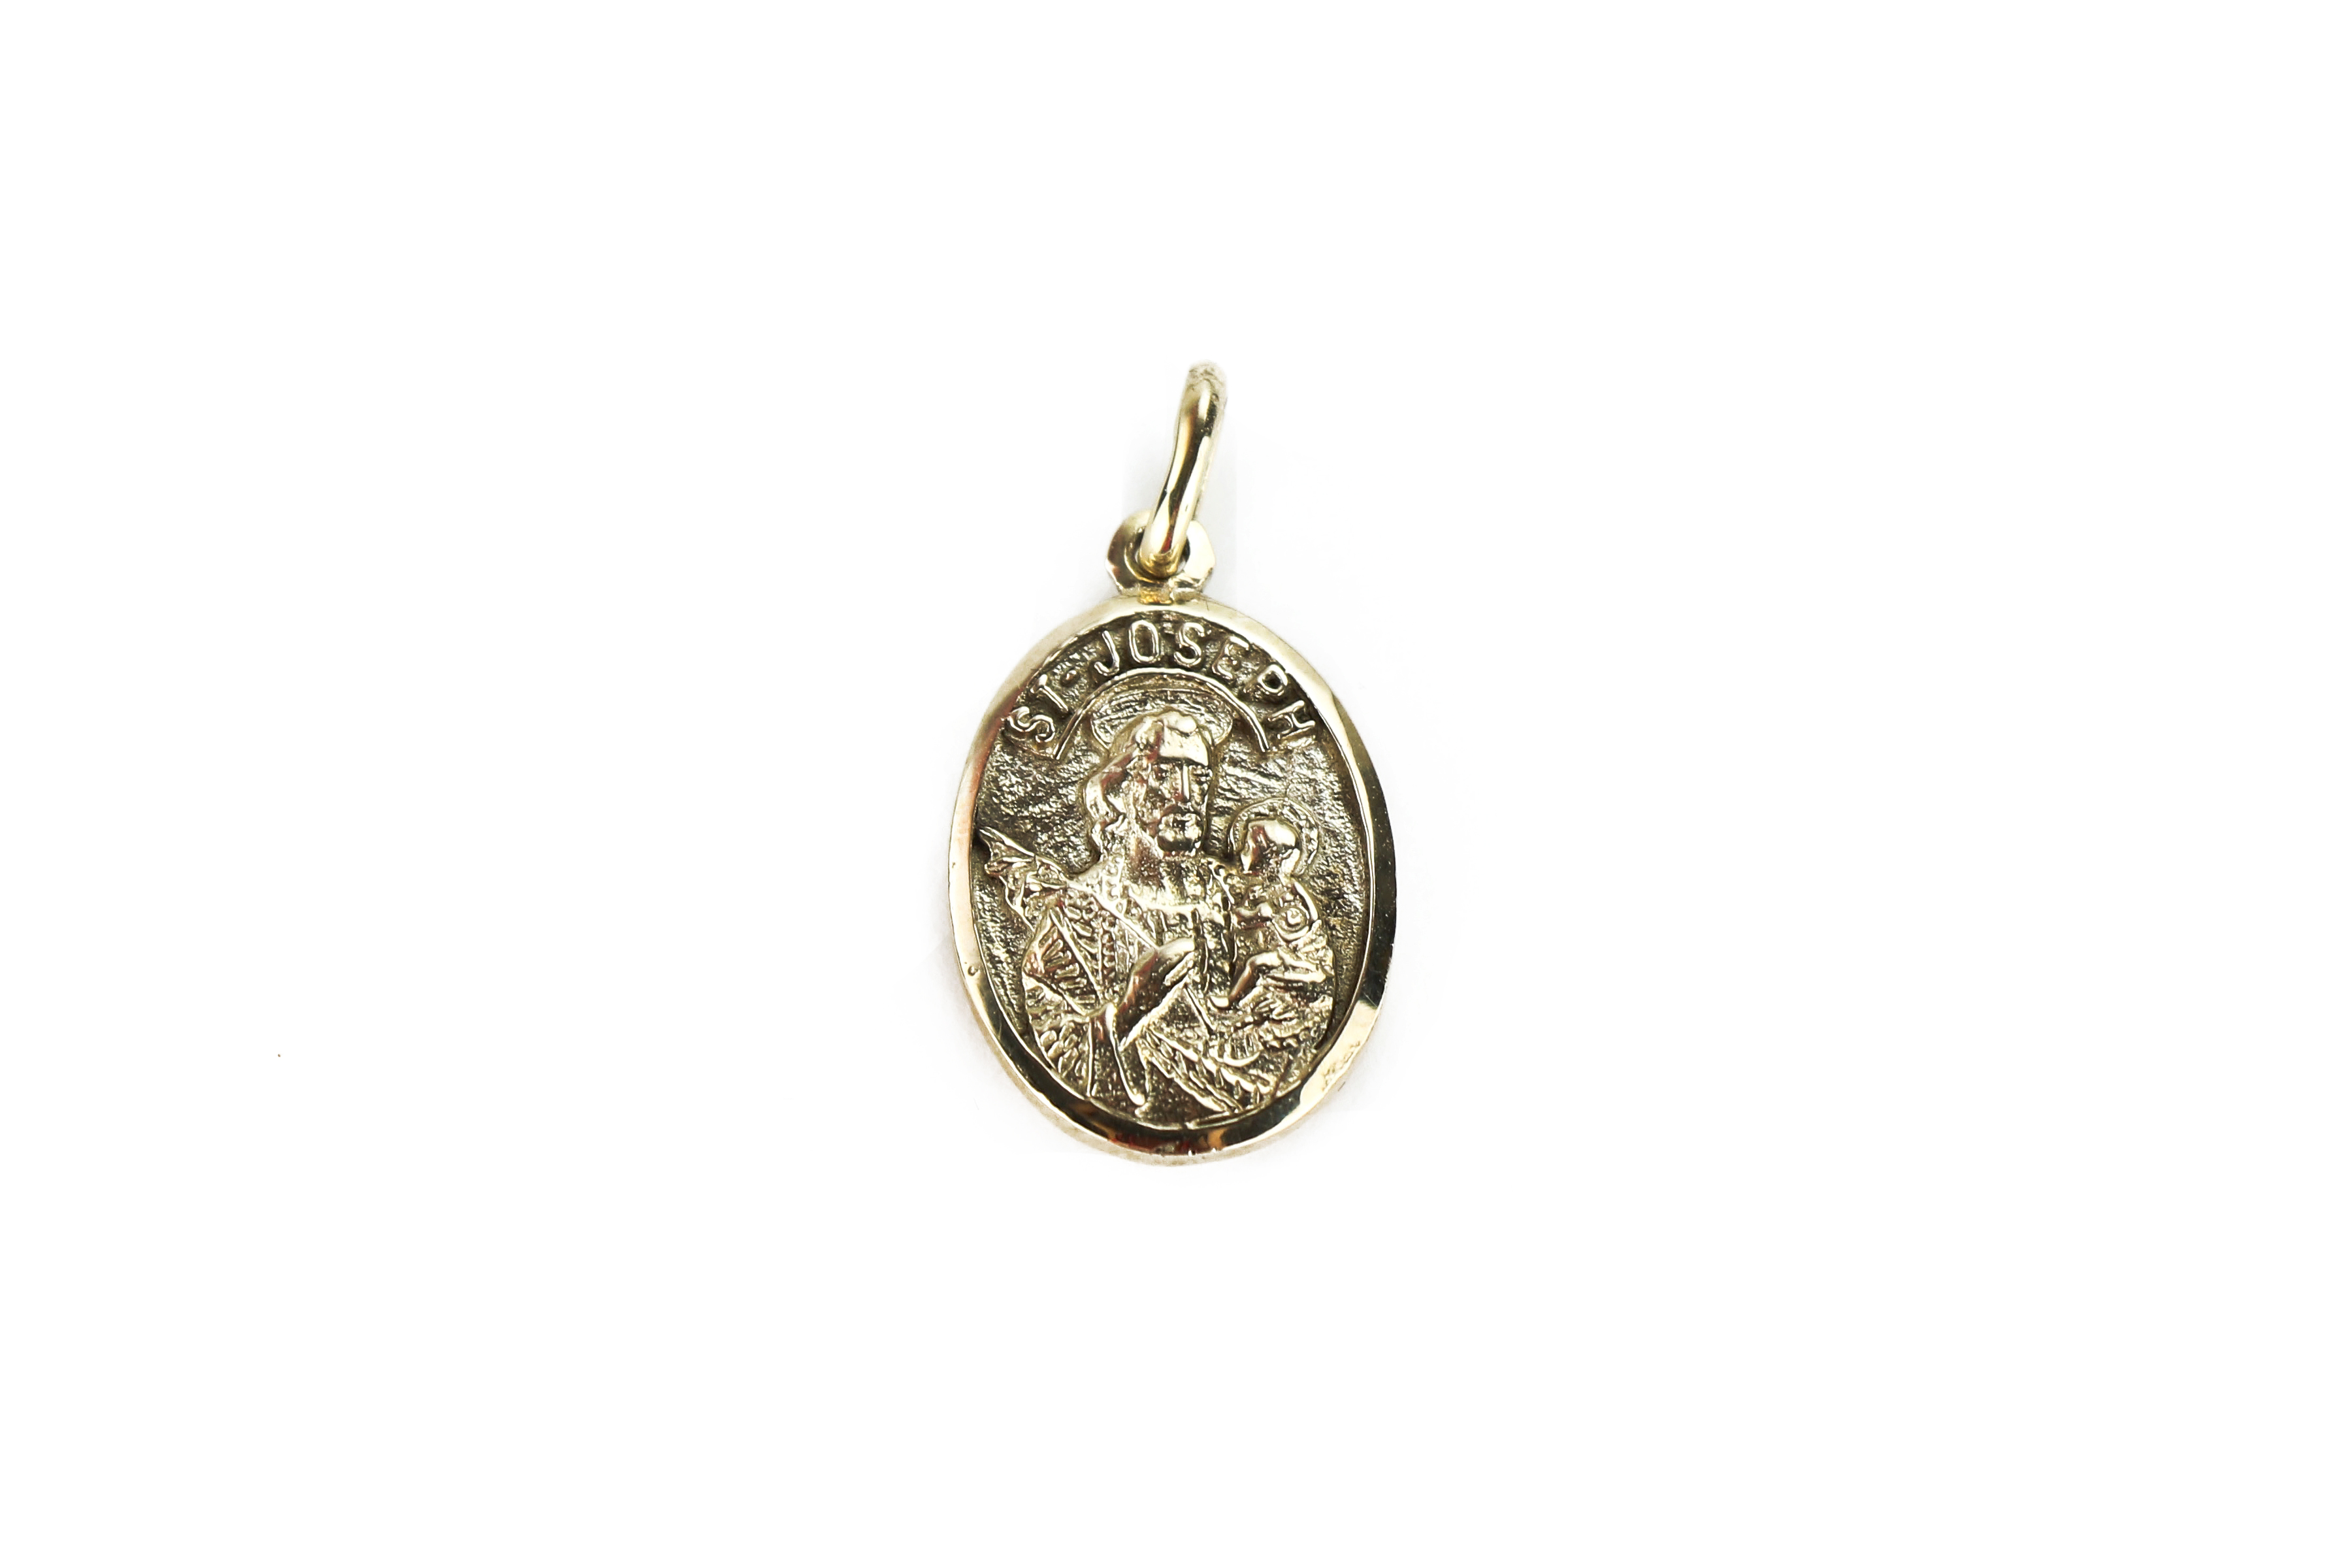 Médaille Ovale / Oval Gold Medal